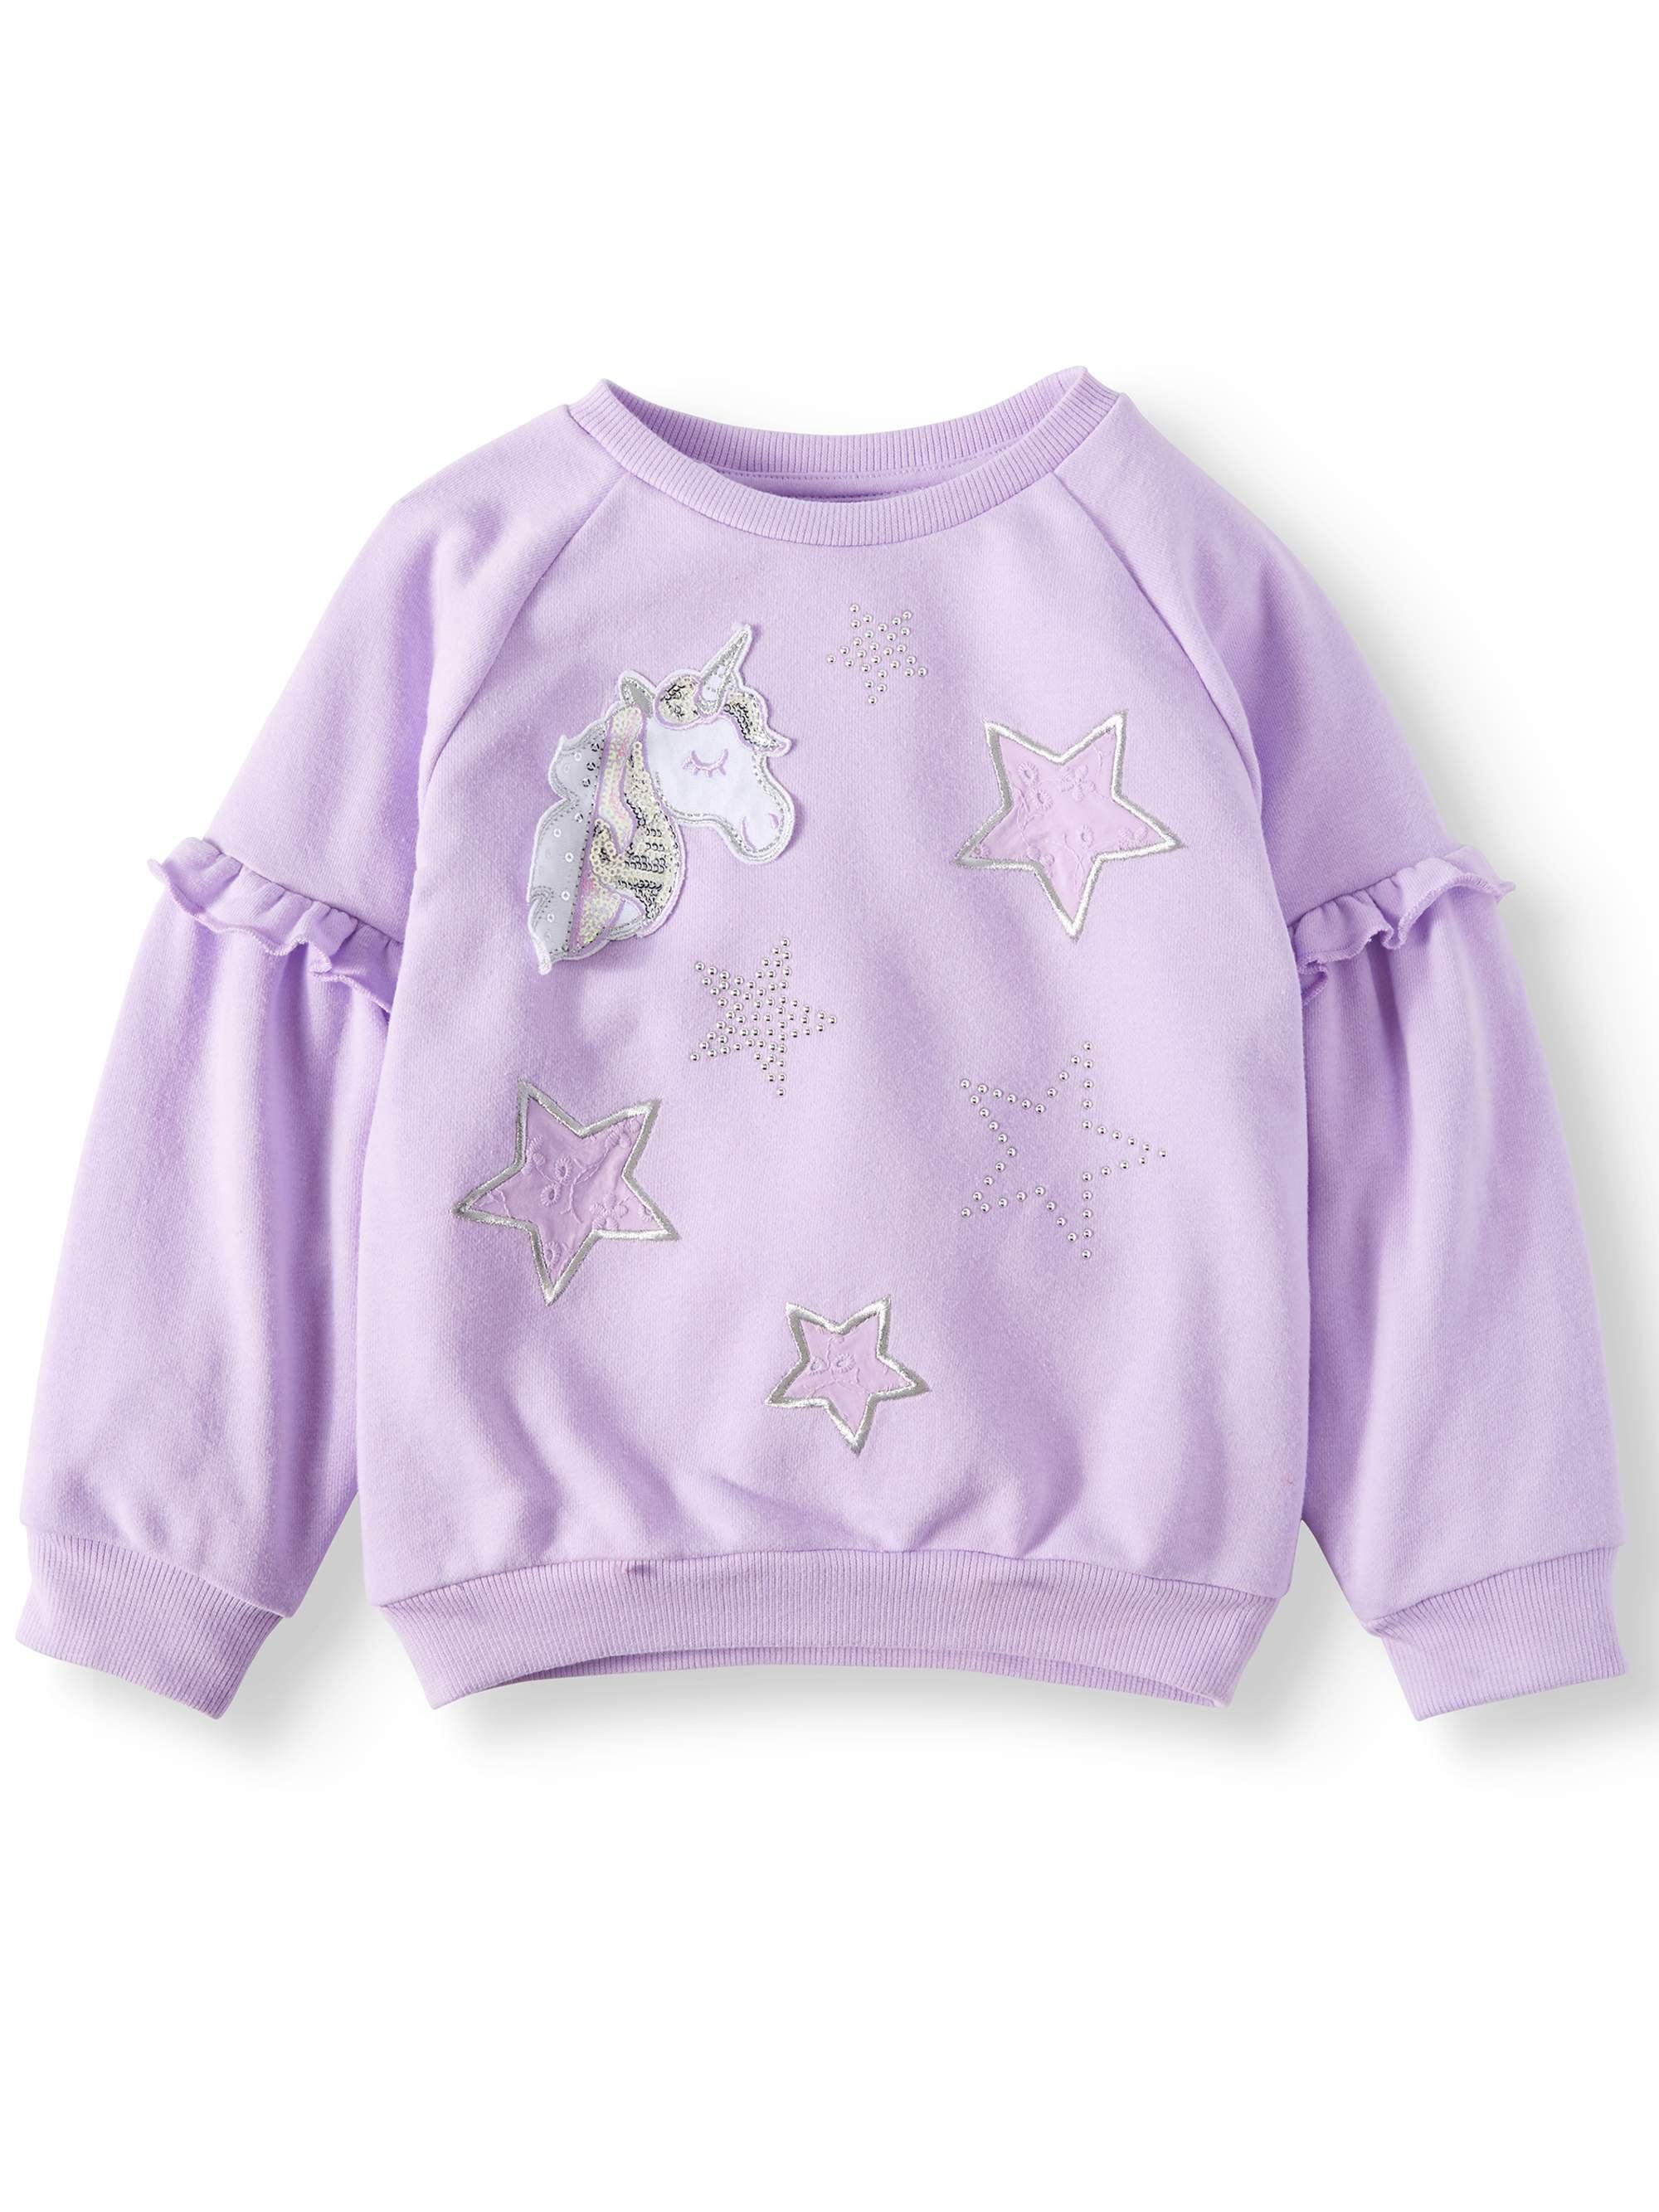 Puff Sleeve French Terry Sweatshirt (Little Girls & Big Girls)